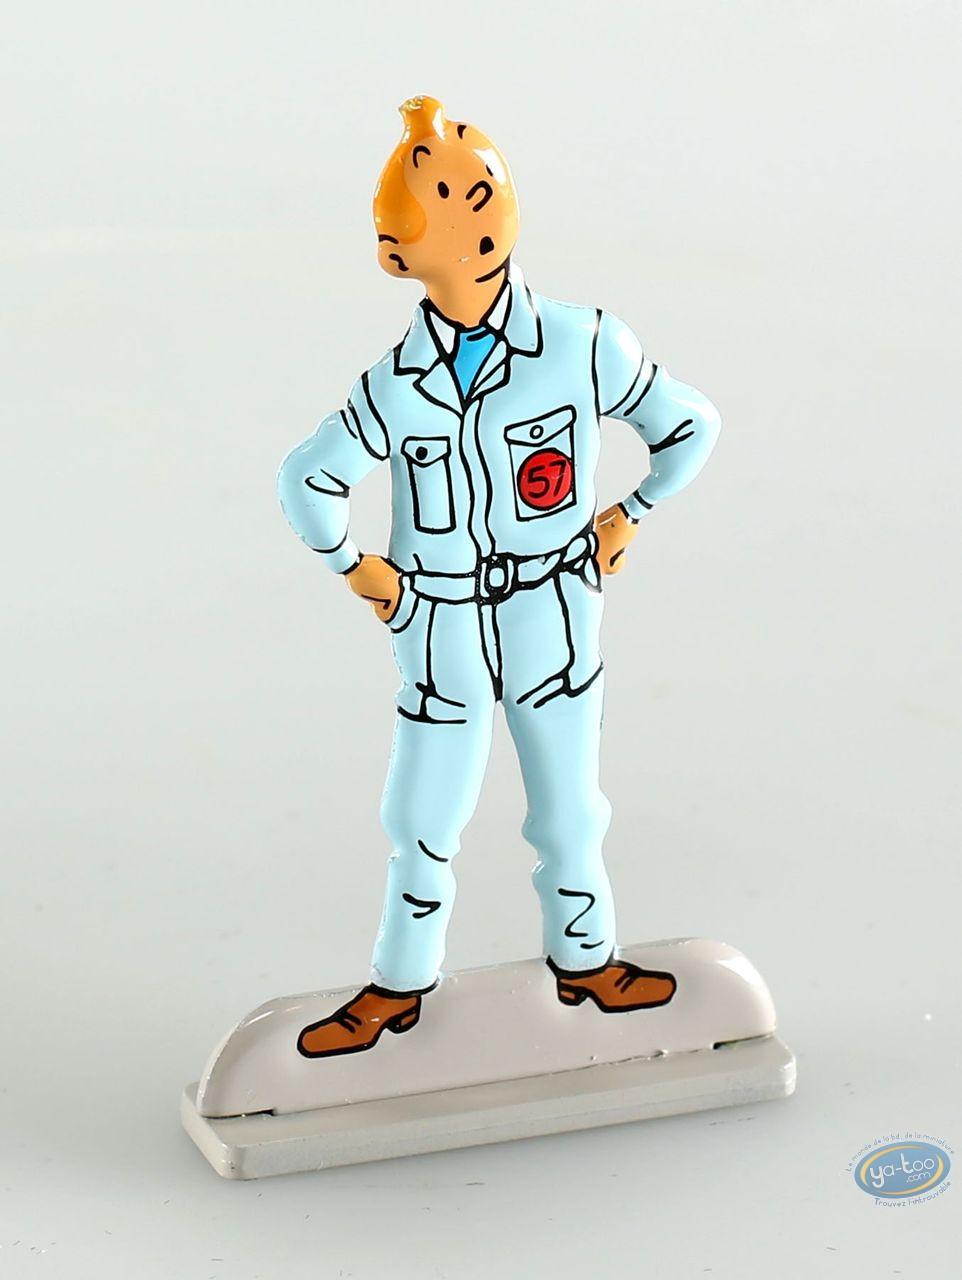 Metal Figurine, Tintin : Objectif lune (bas relief)